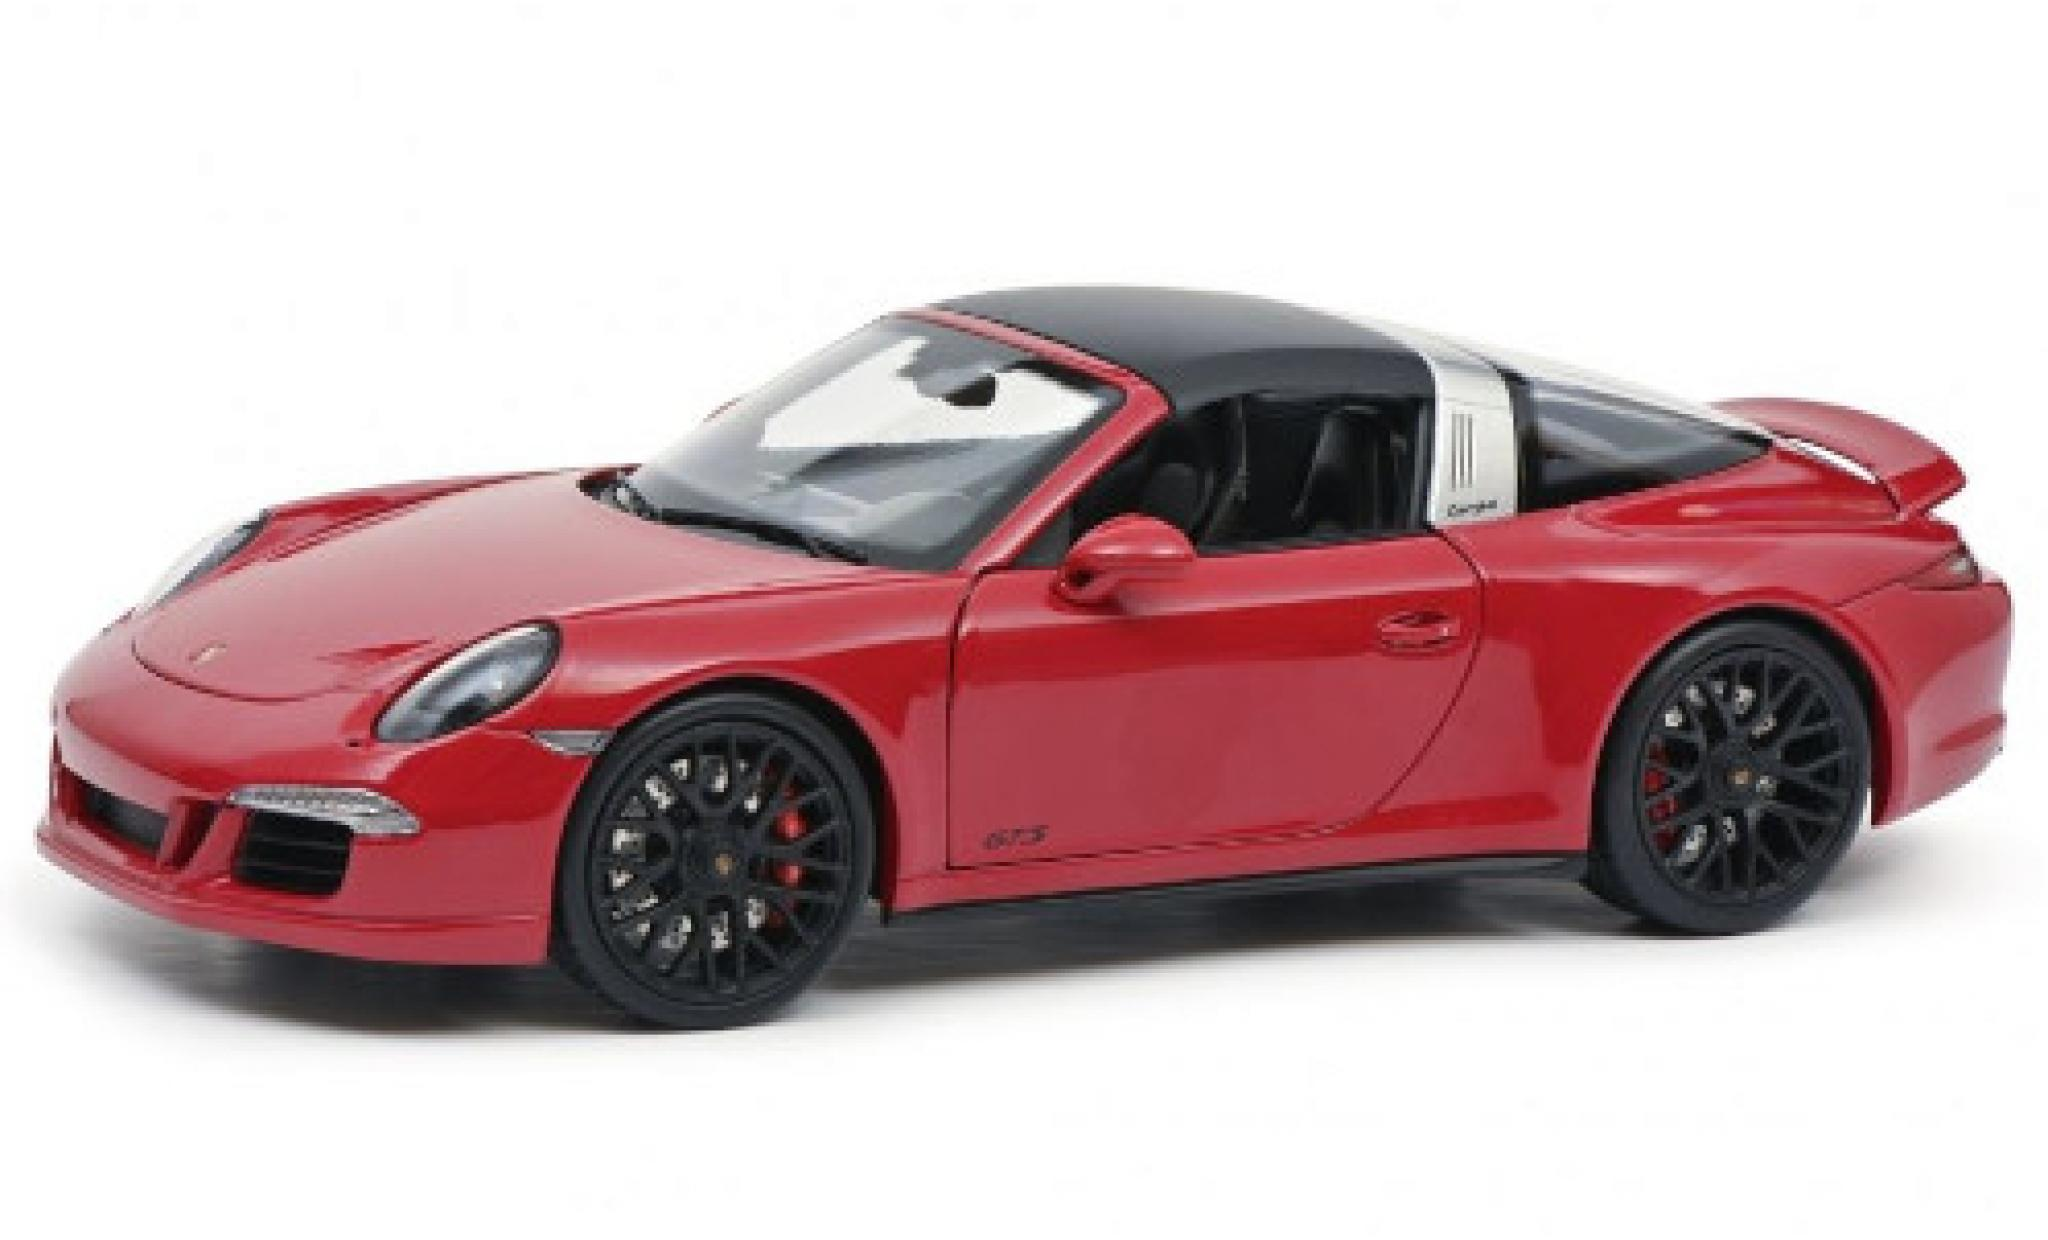 Porsche 991 Targa 1/18 Schuco 911 Carrera 4 GTS (.1) red 2014 toit détachable